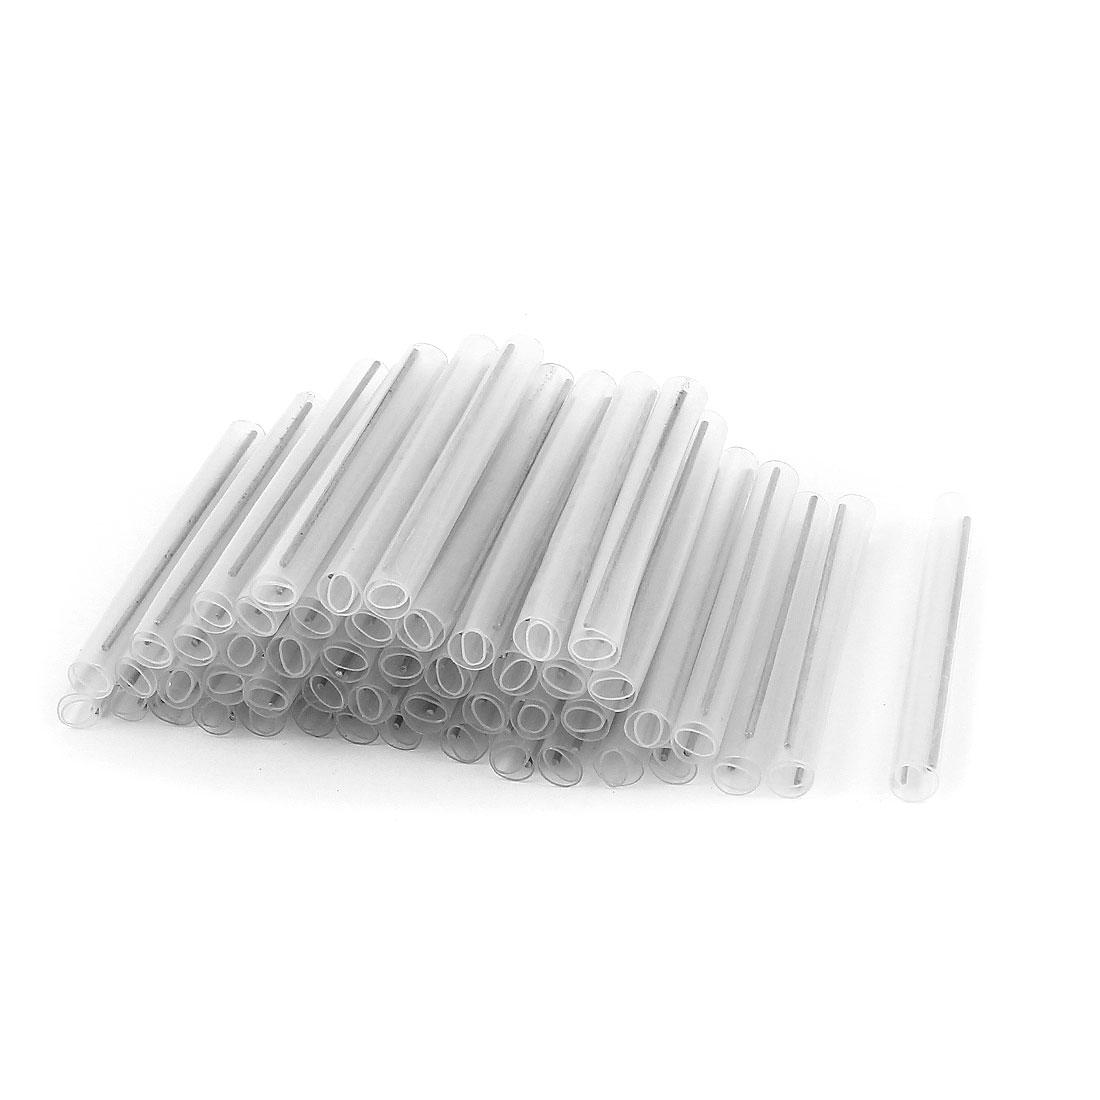 200 Pcs Protective Sleeve Fiber Optic Splicing Tube Dual-Needle 6cm Long